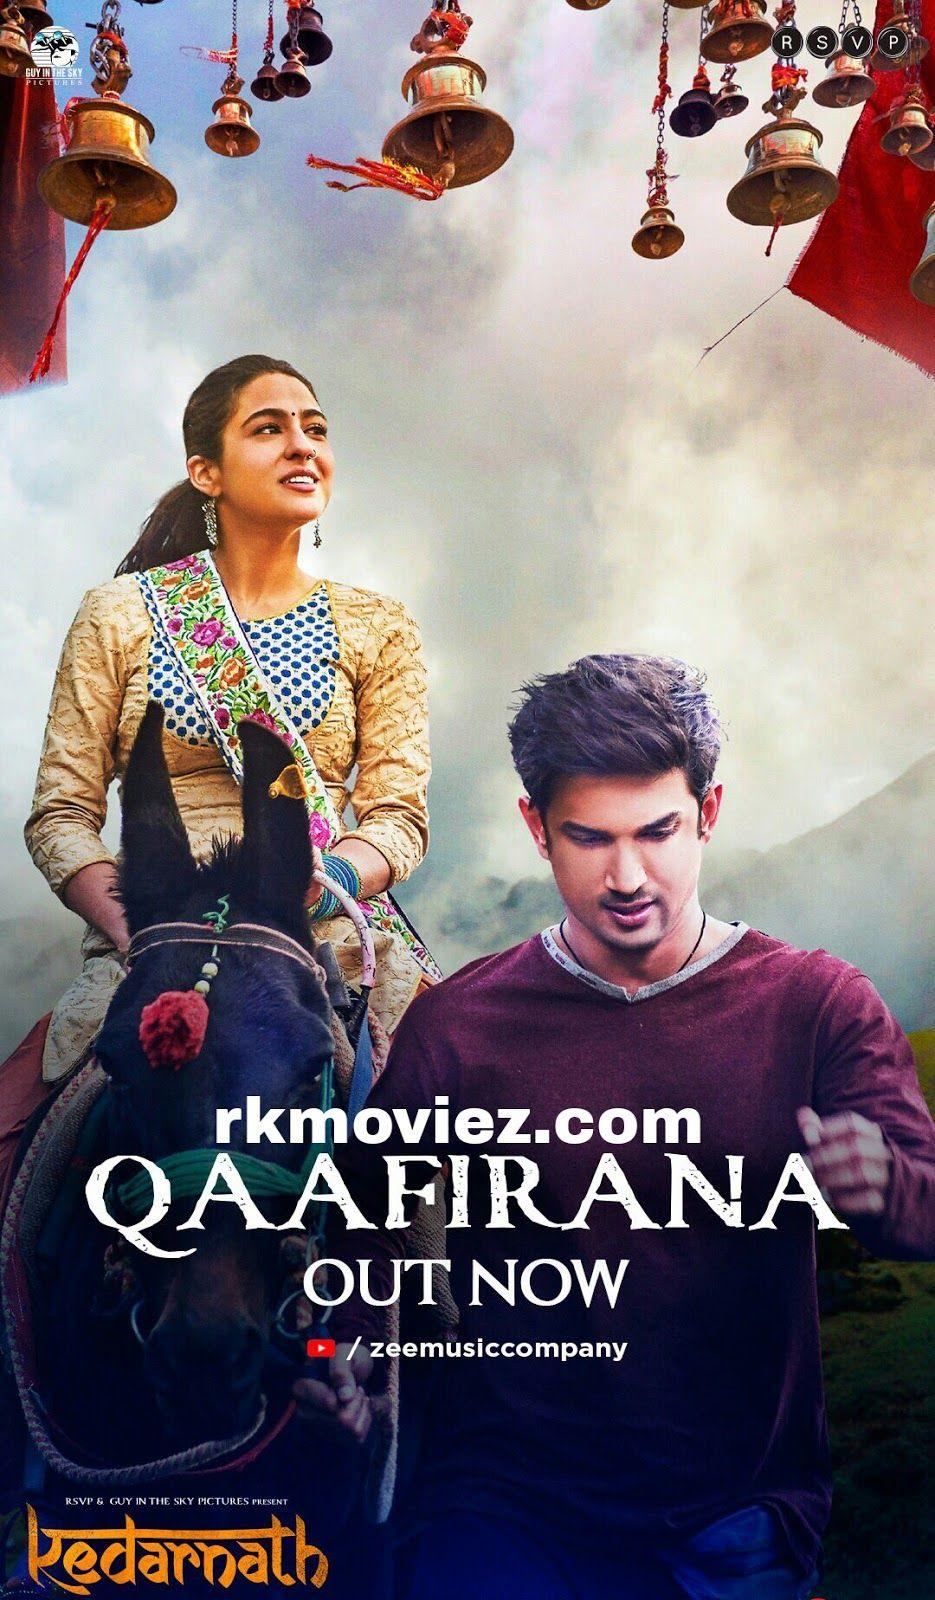 kedarnath (film) watch online free